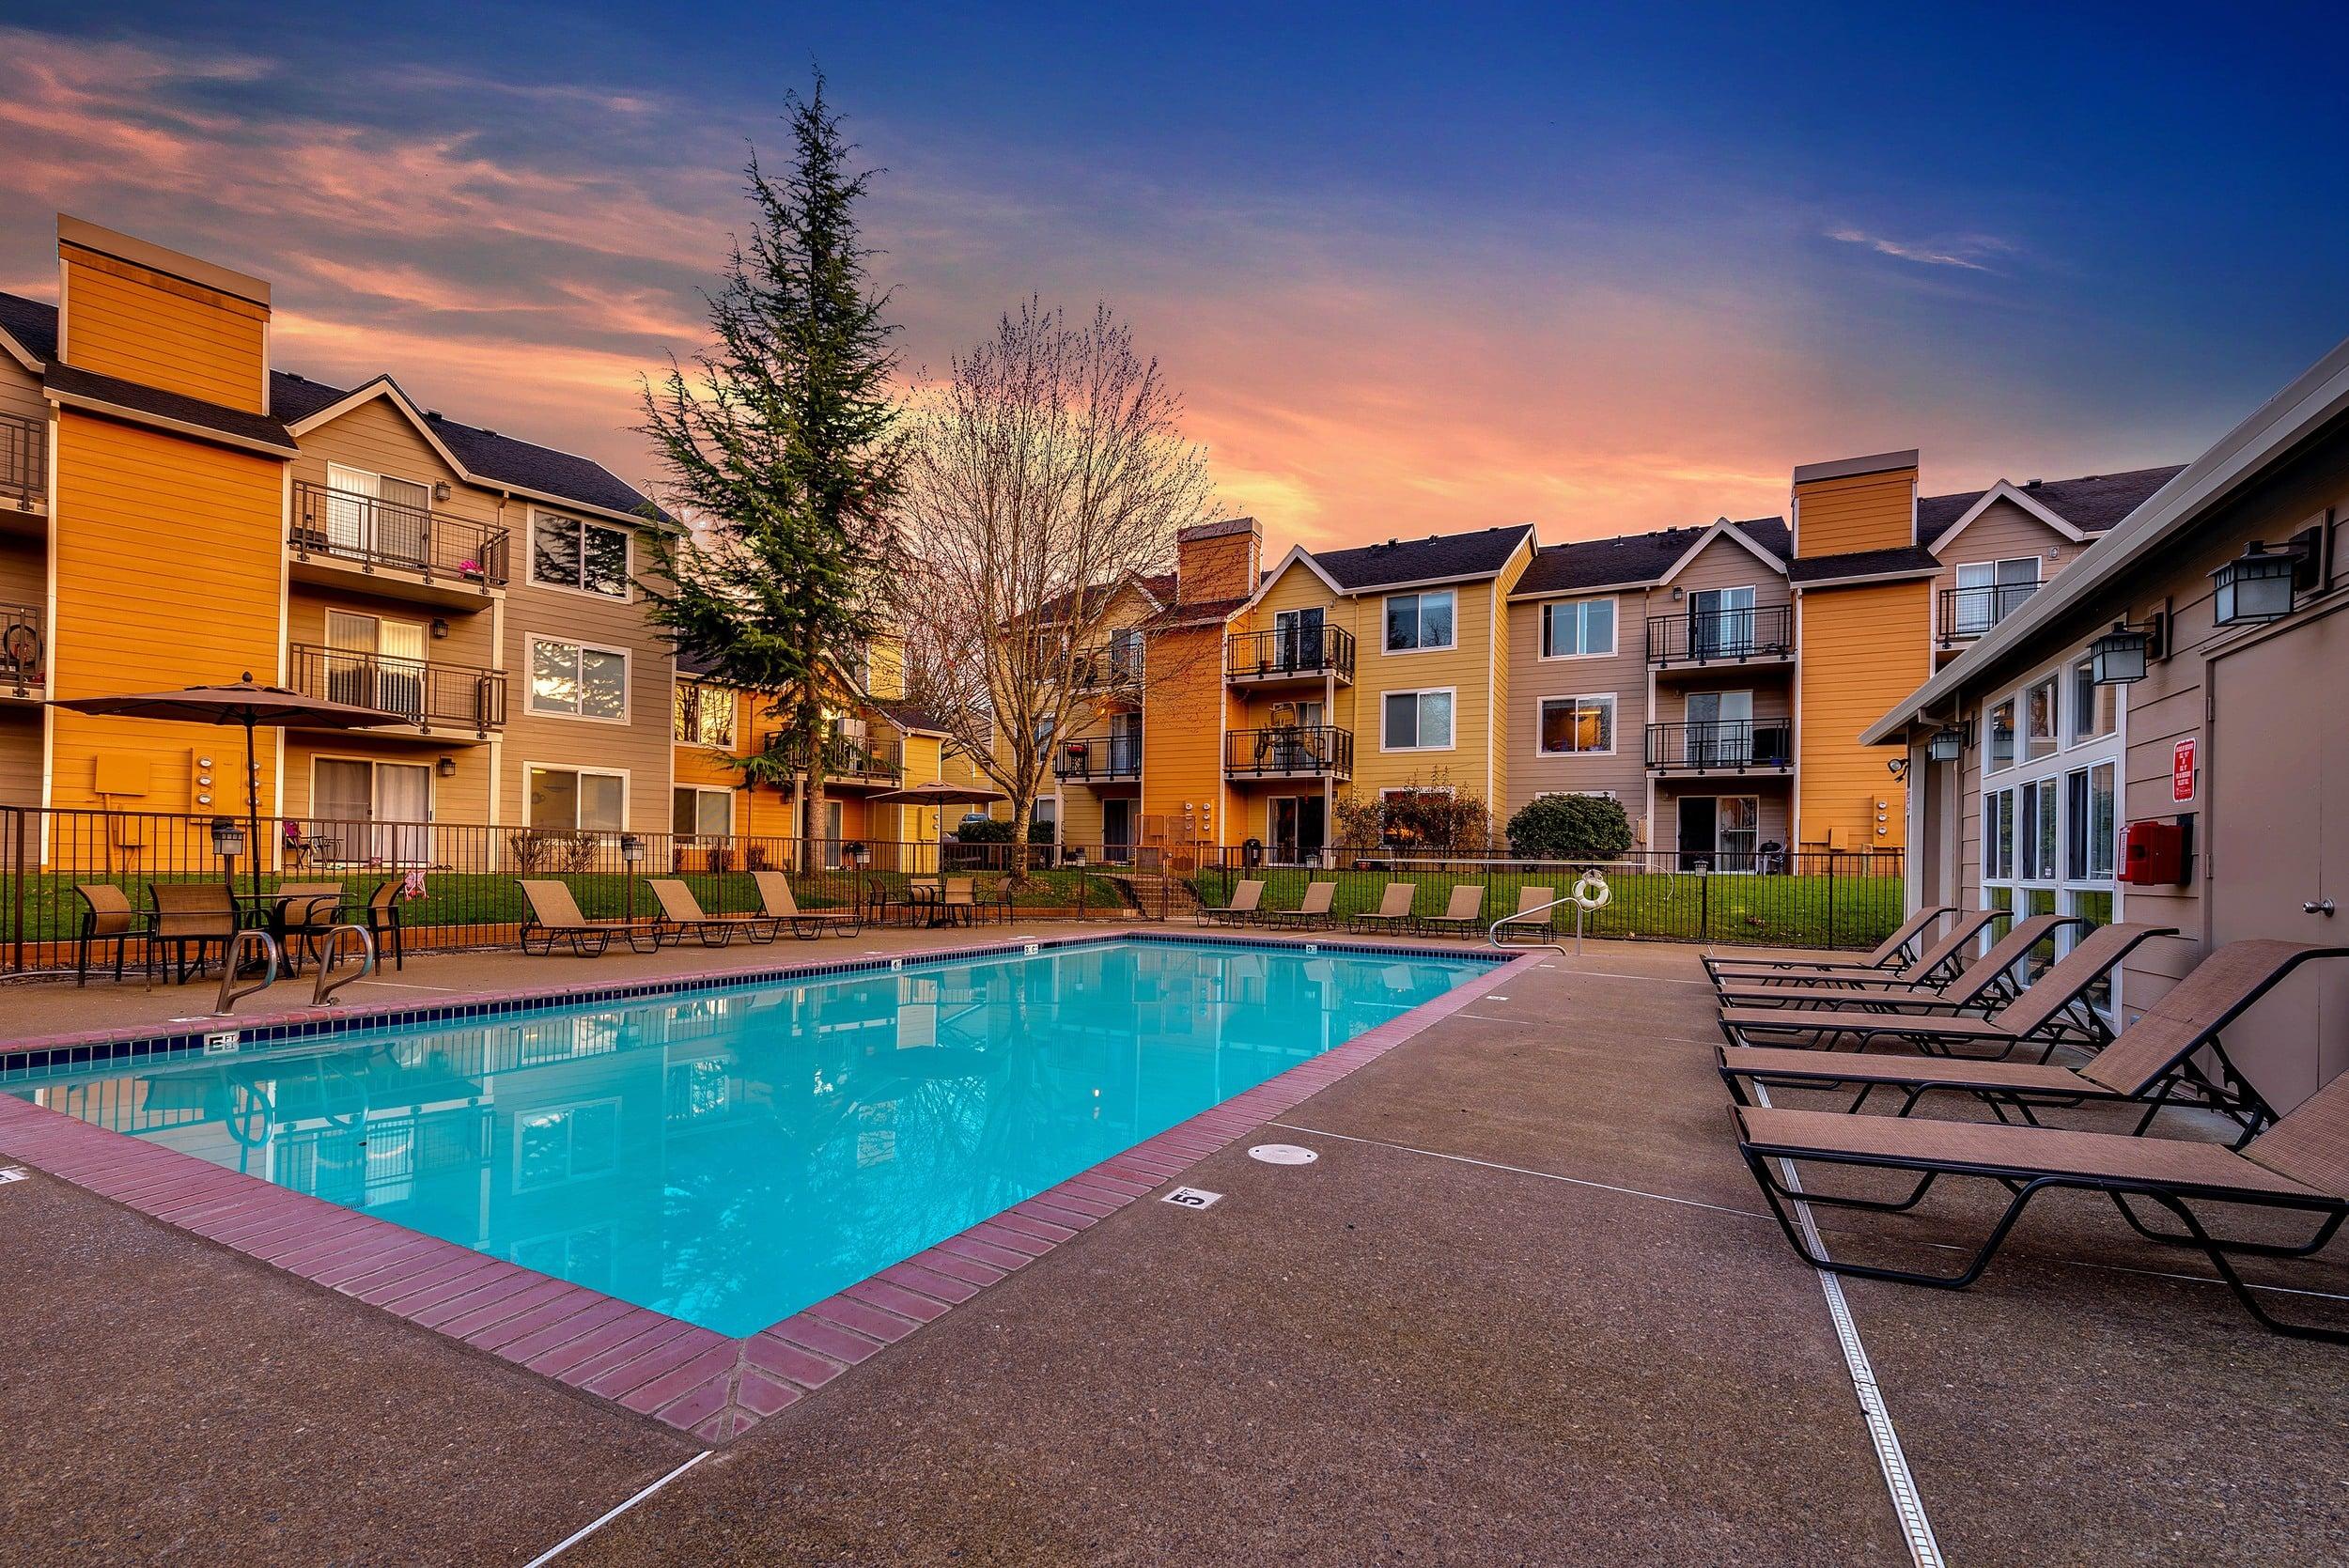 Swimming Pool At Preserve at Sunnyside Apartments In Clackamas OR